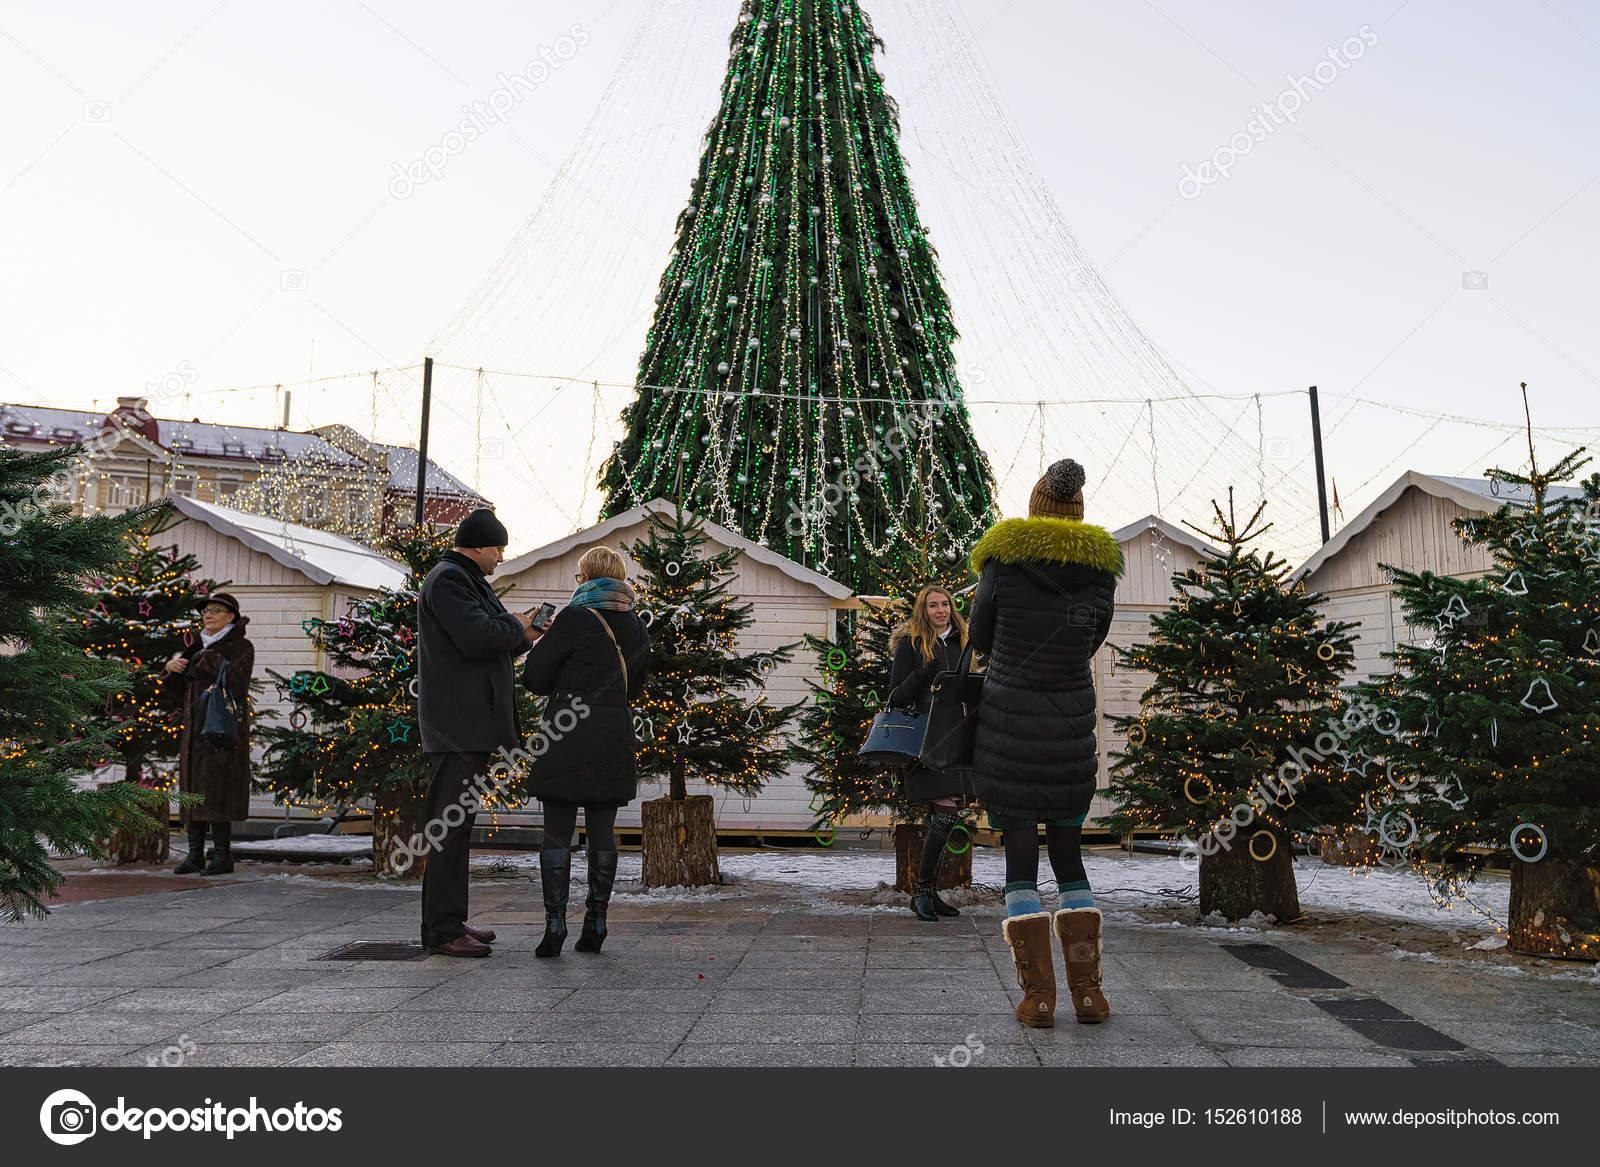 967ca30a7e5 Άνθρωποι λαμβάνουν φωτογραφία Χριστούγεννα δέντρα αγορά στο Βίλνιους  Λιθουανίας– Εκδοτικές Φωτογραφίες Αρχείου